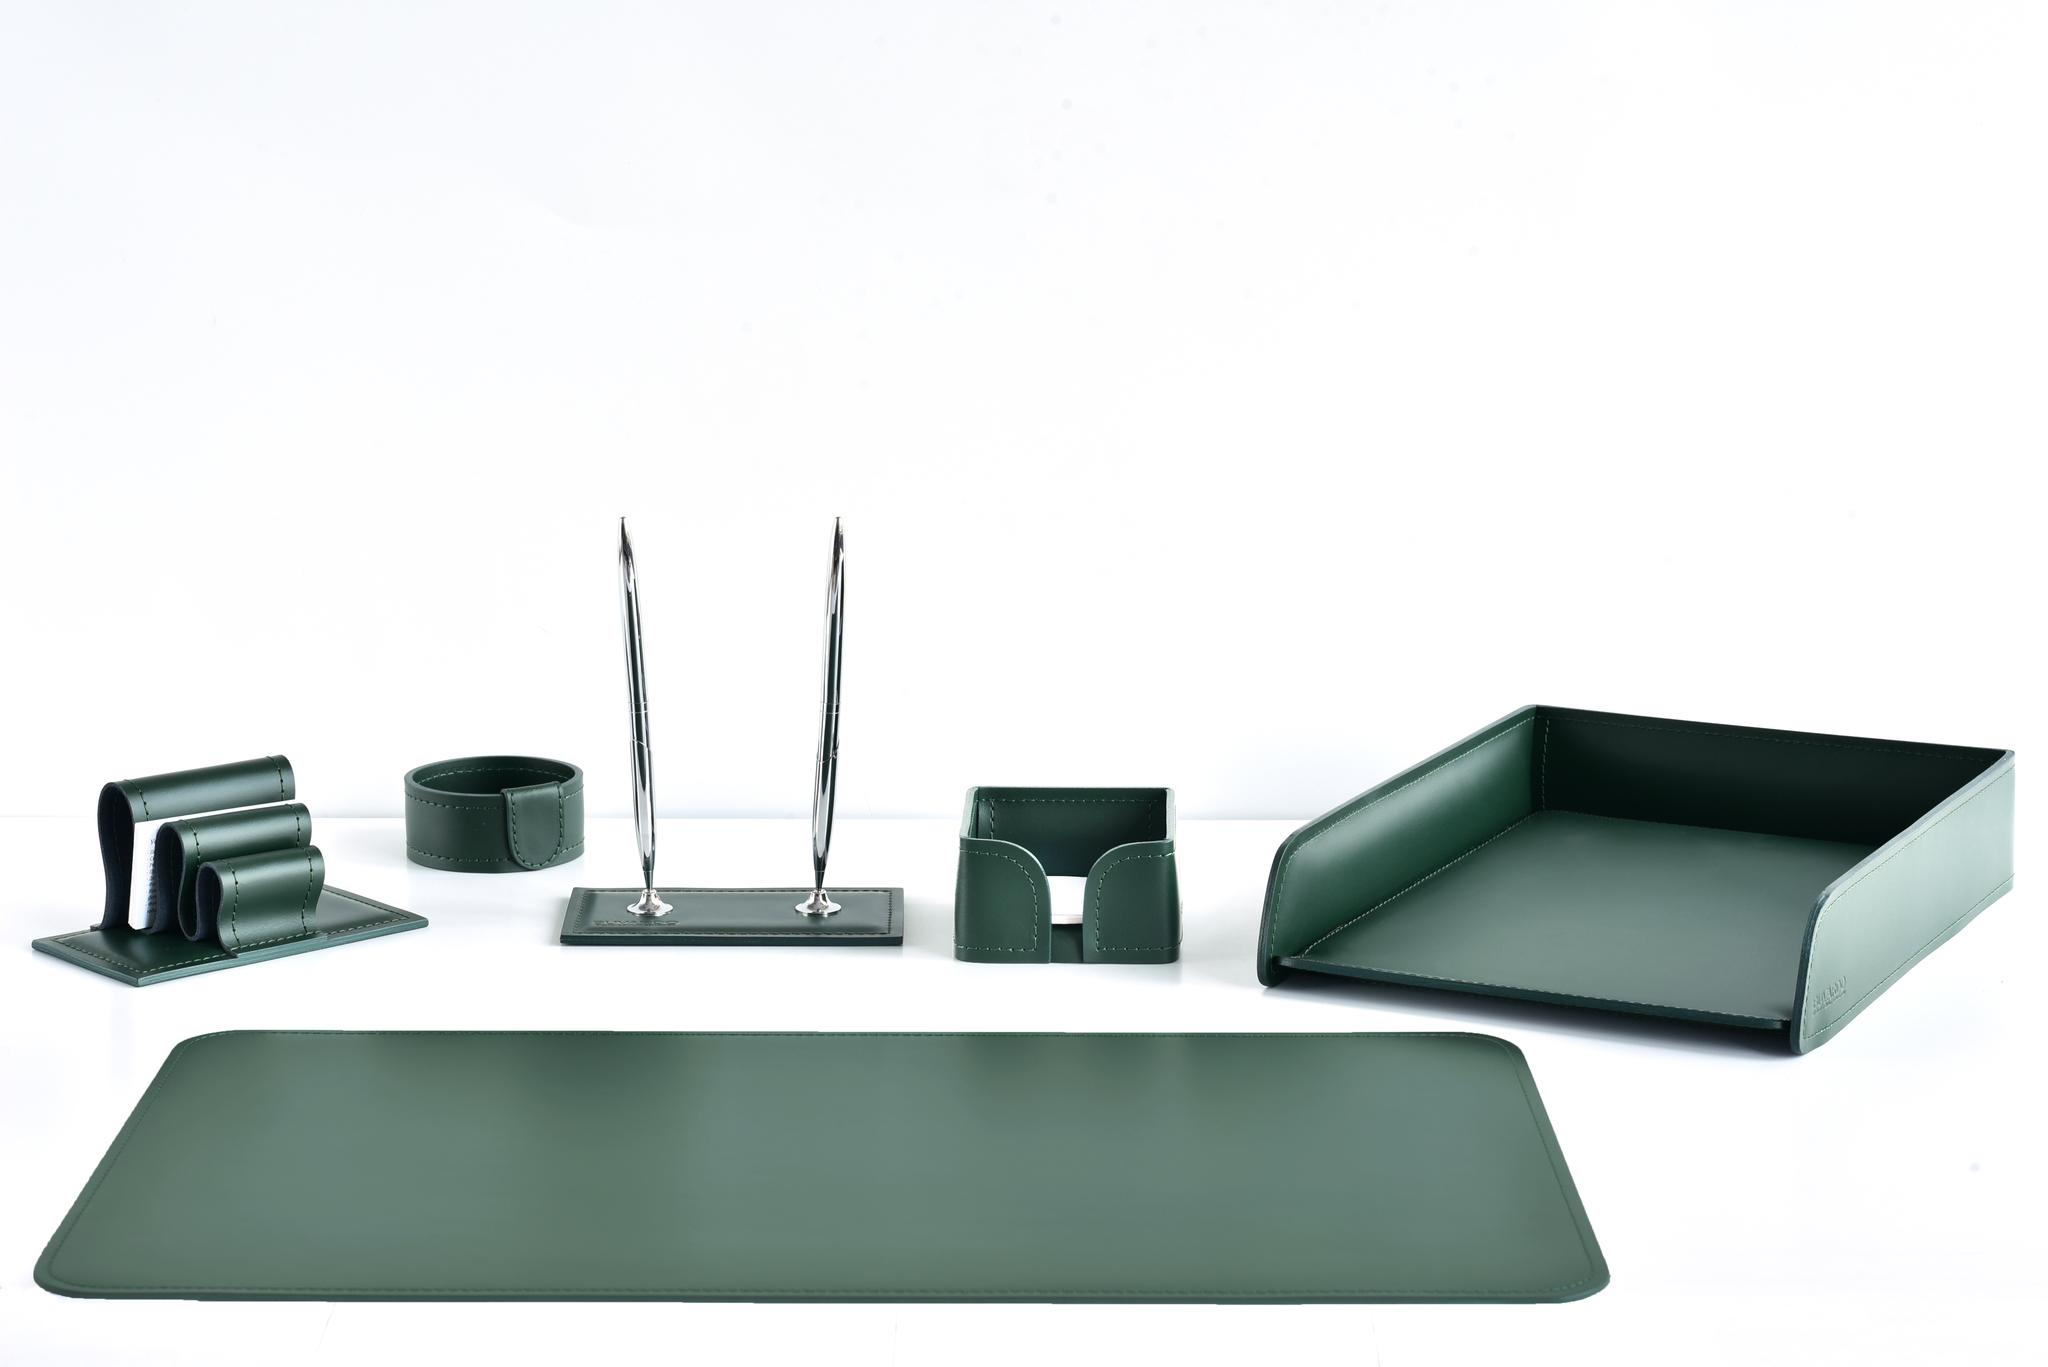 зеленый набор на стол